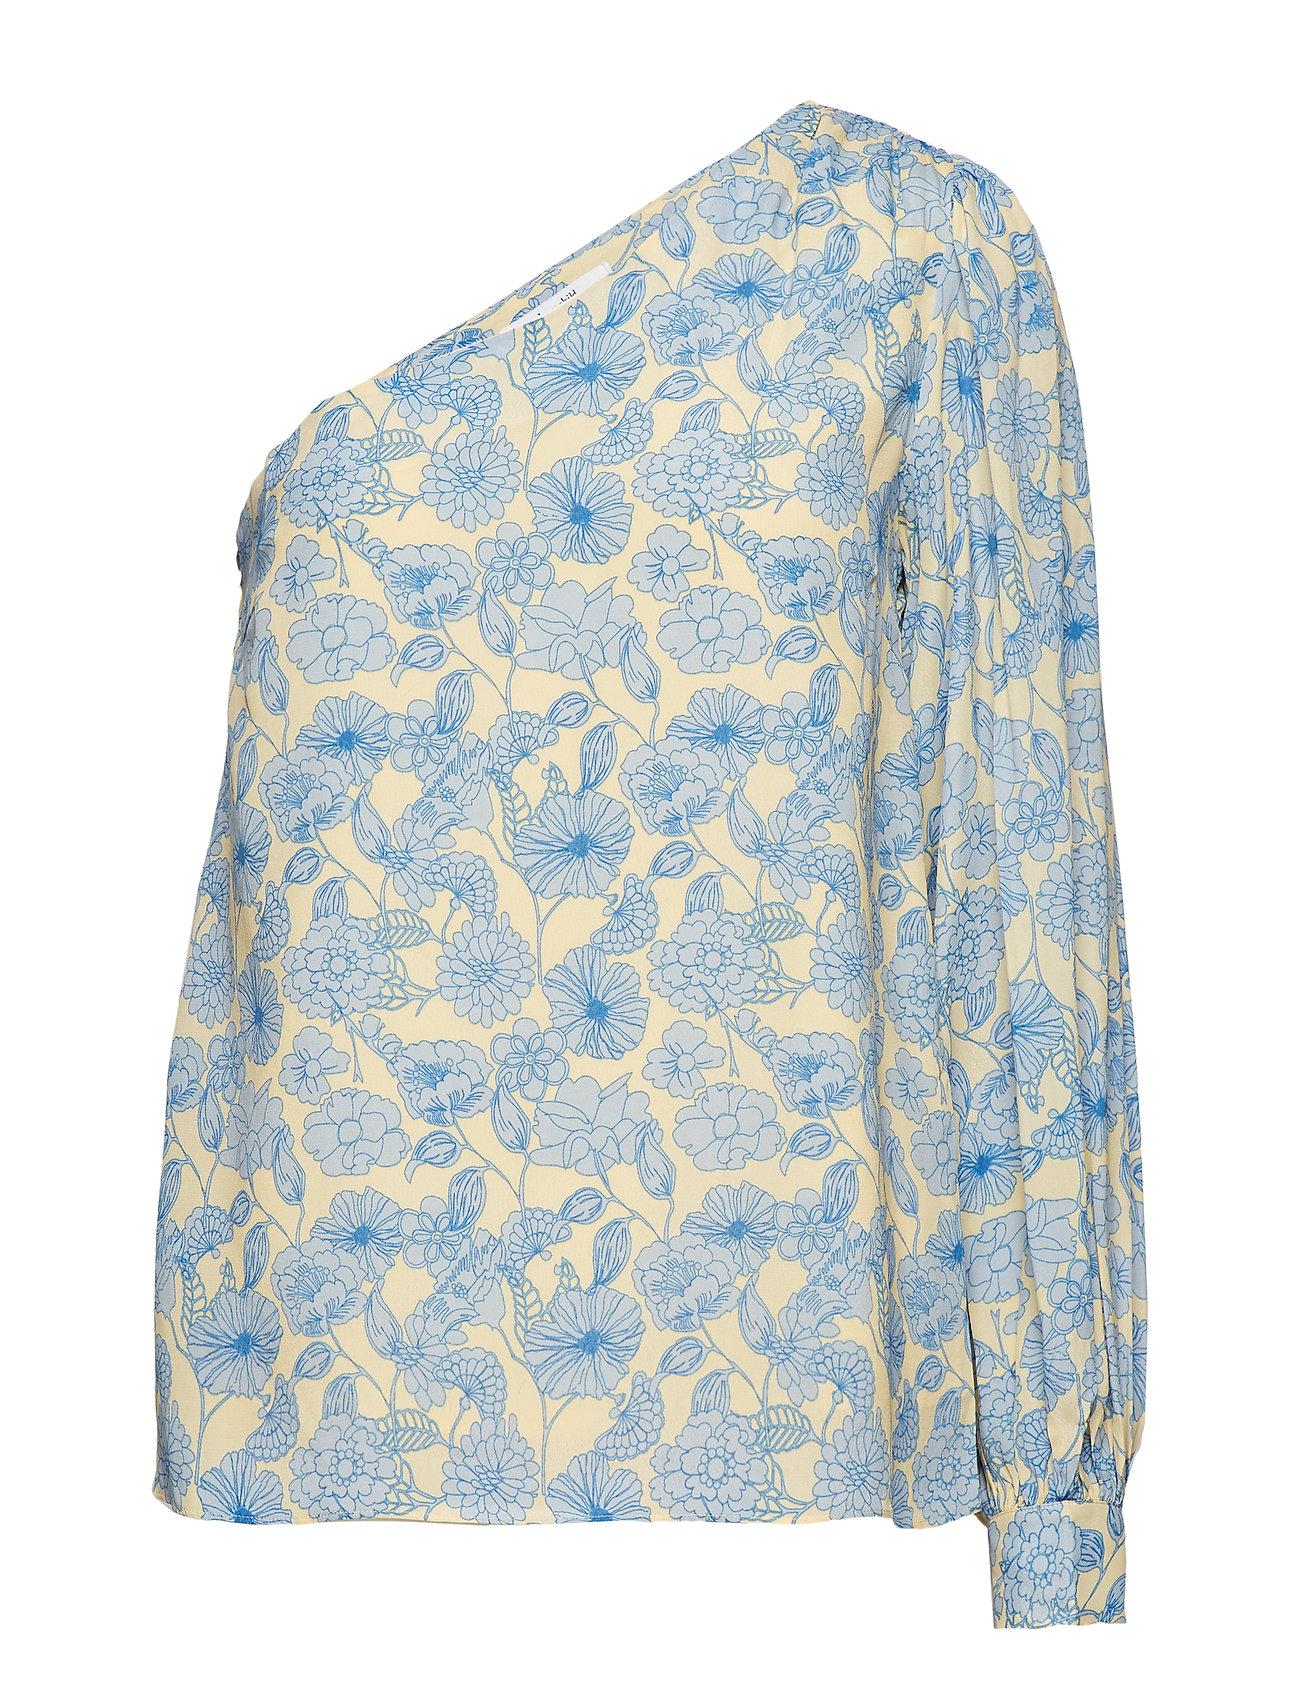 Lovechild 1979 Rida Shirt - DUSTY BLUE